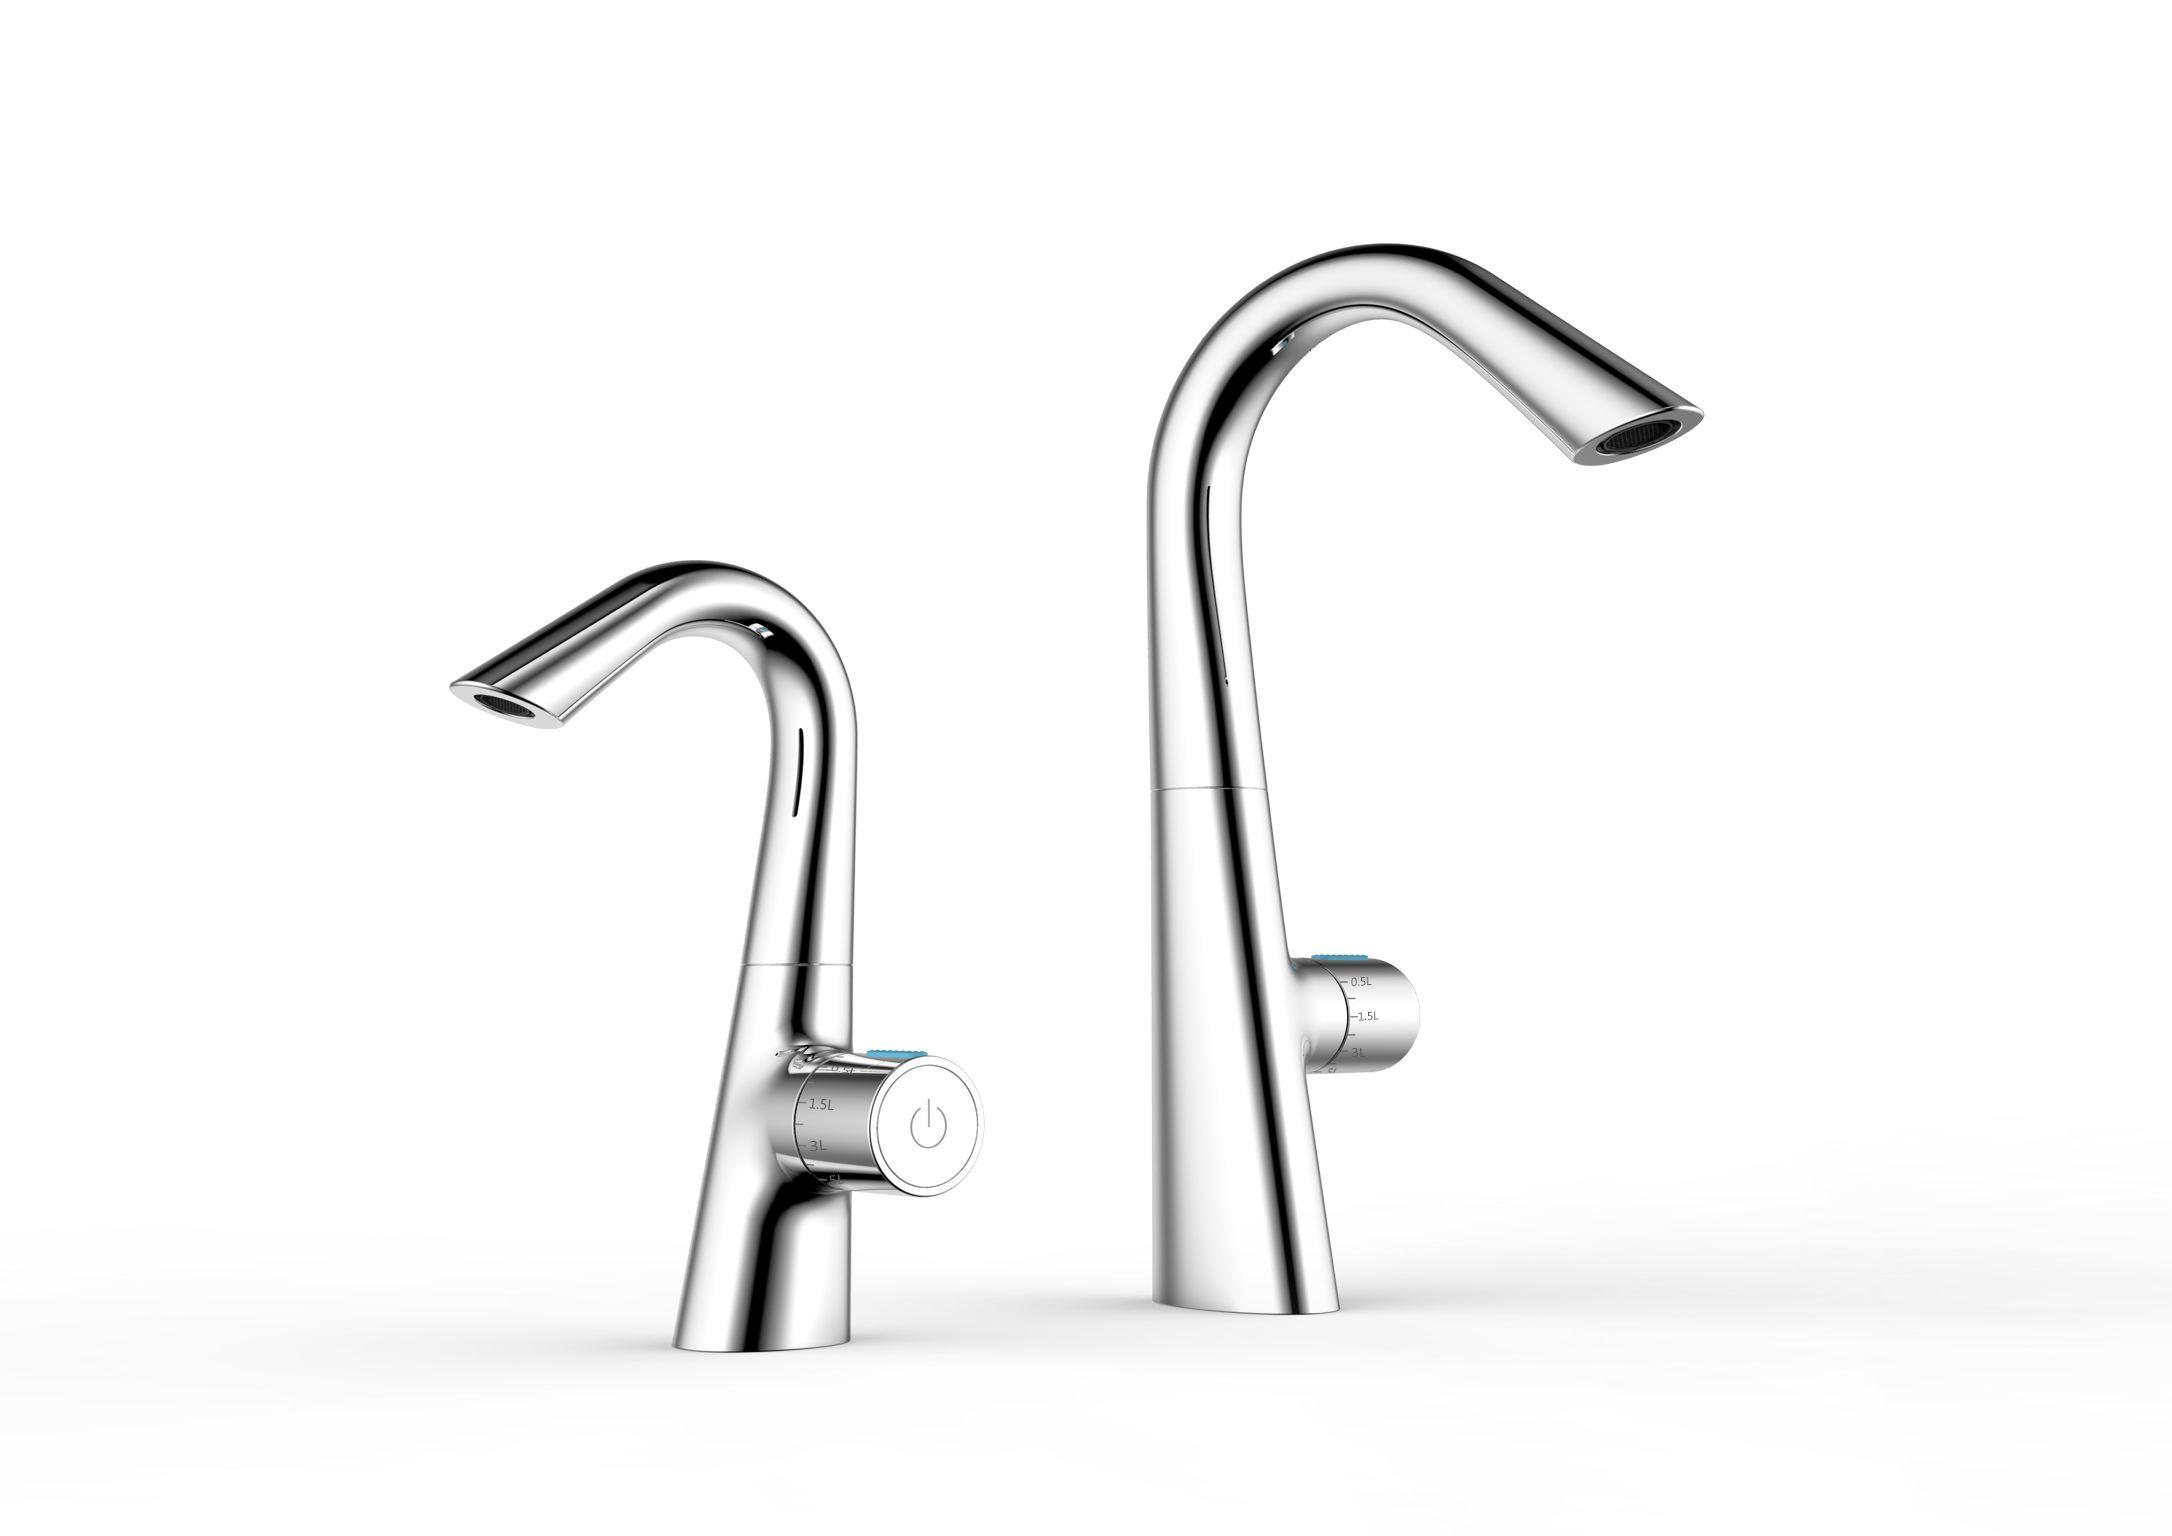 Award Winning Design Since 1953 Smart Faucet Design Awards Faucet [ 1536 x 2172 Pixel ]